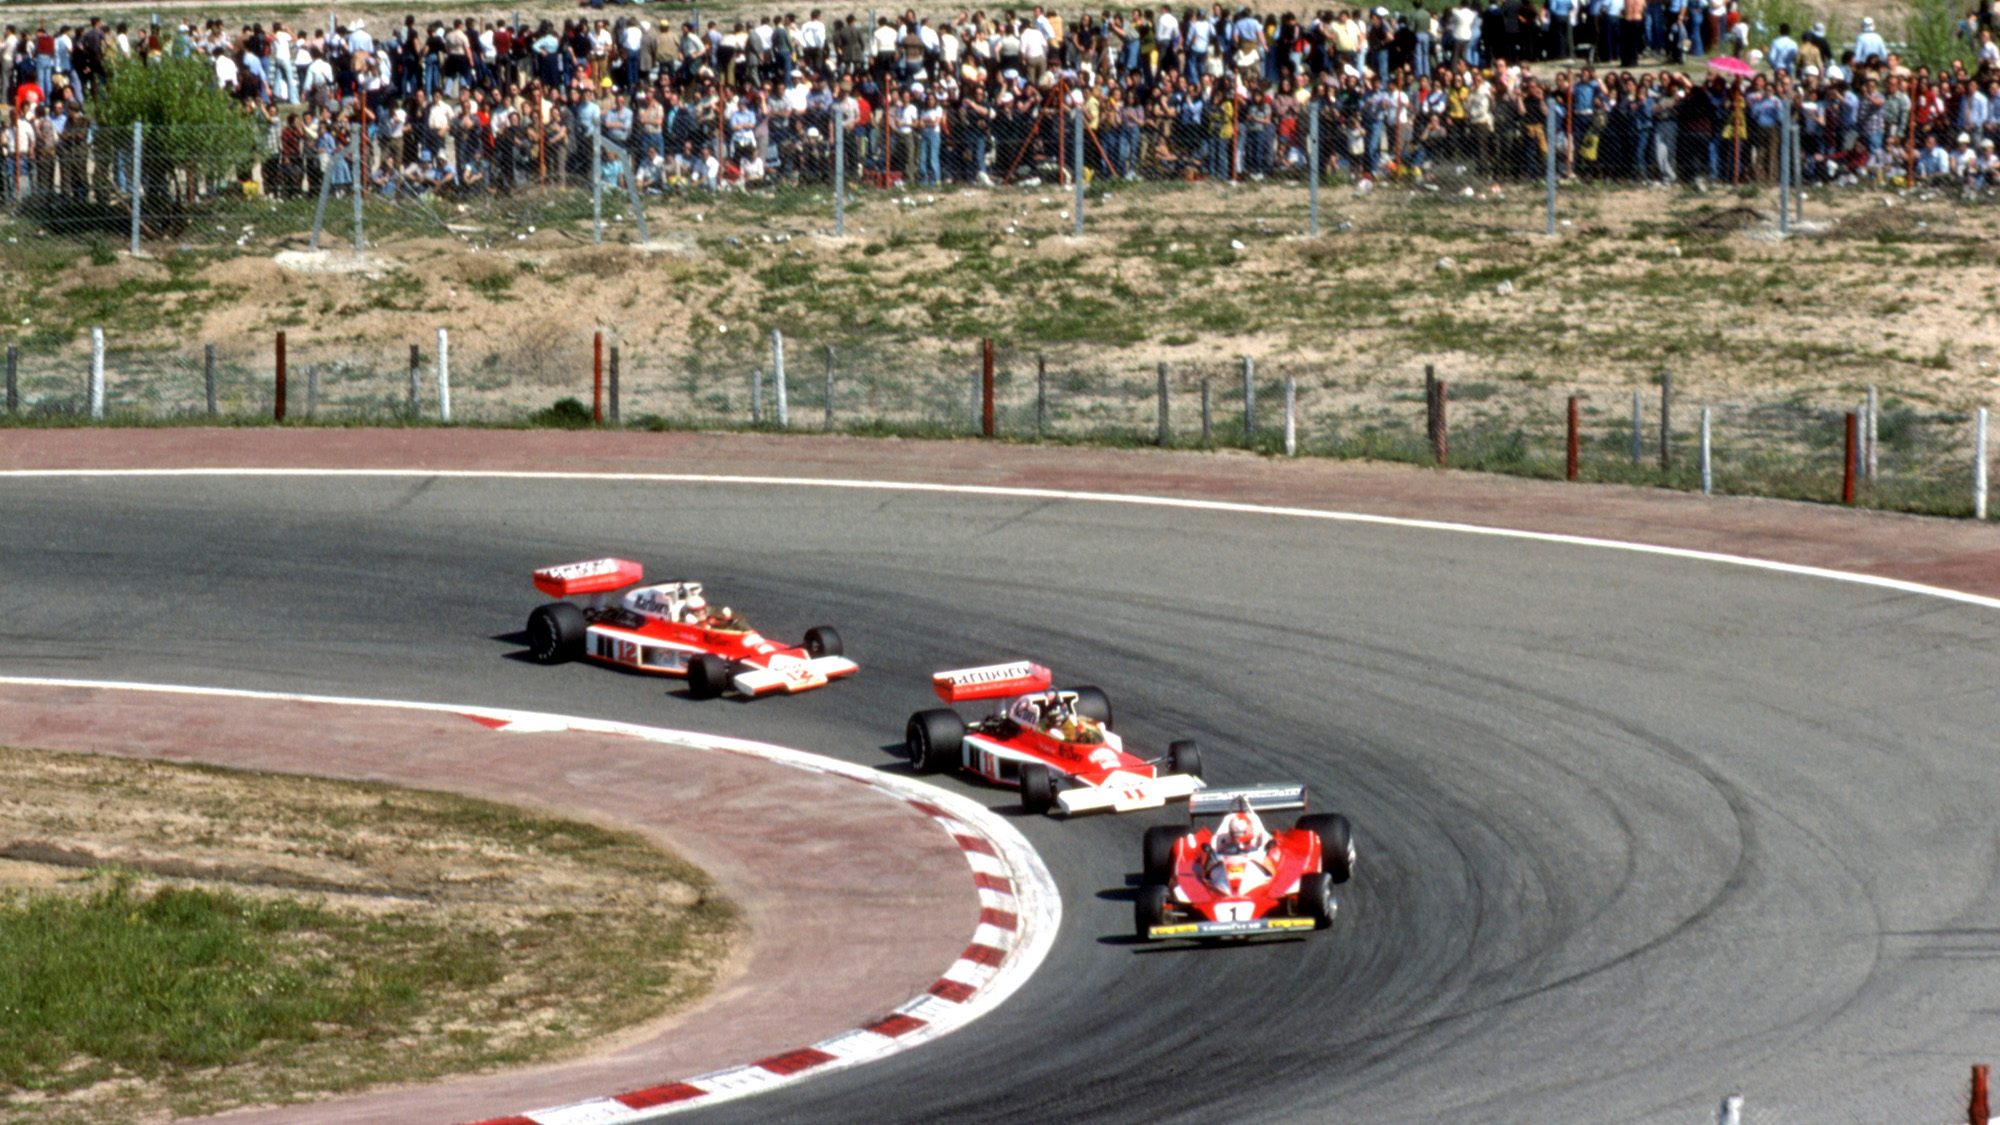 Niki Lauda leads James Hunt and Jochen Mass at the 1976 Spanish Grand Prix